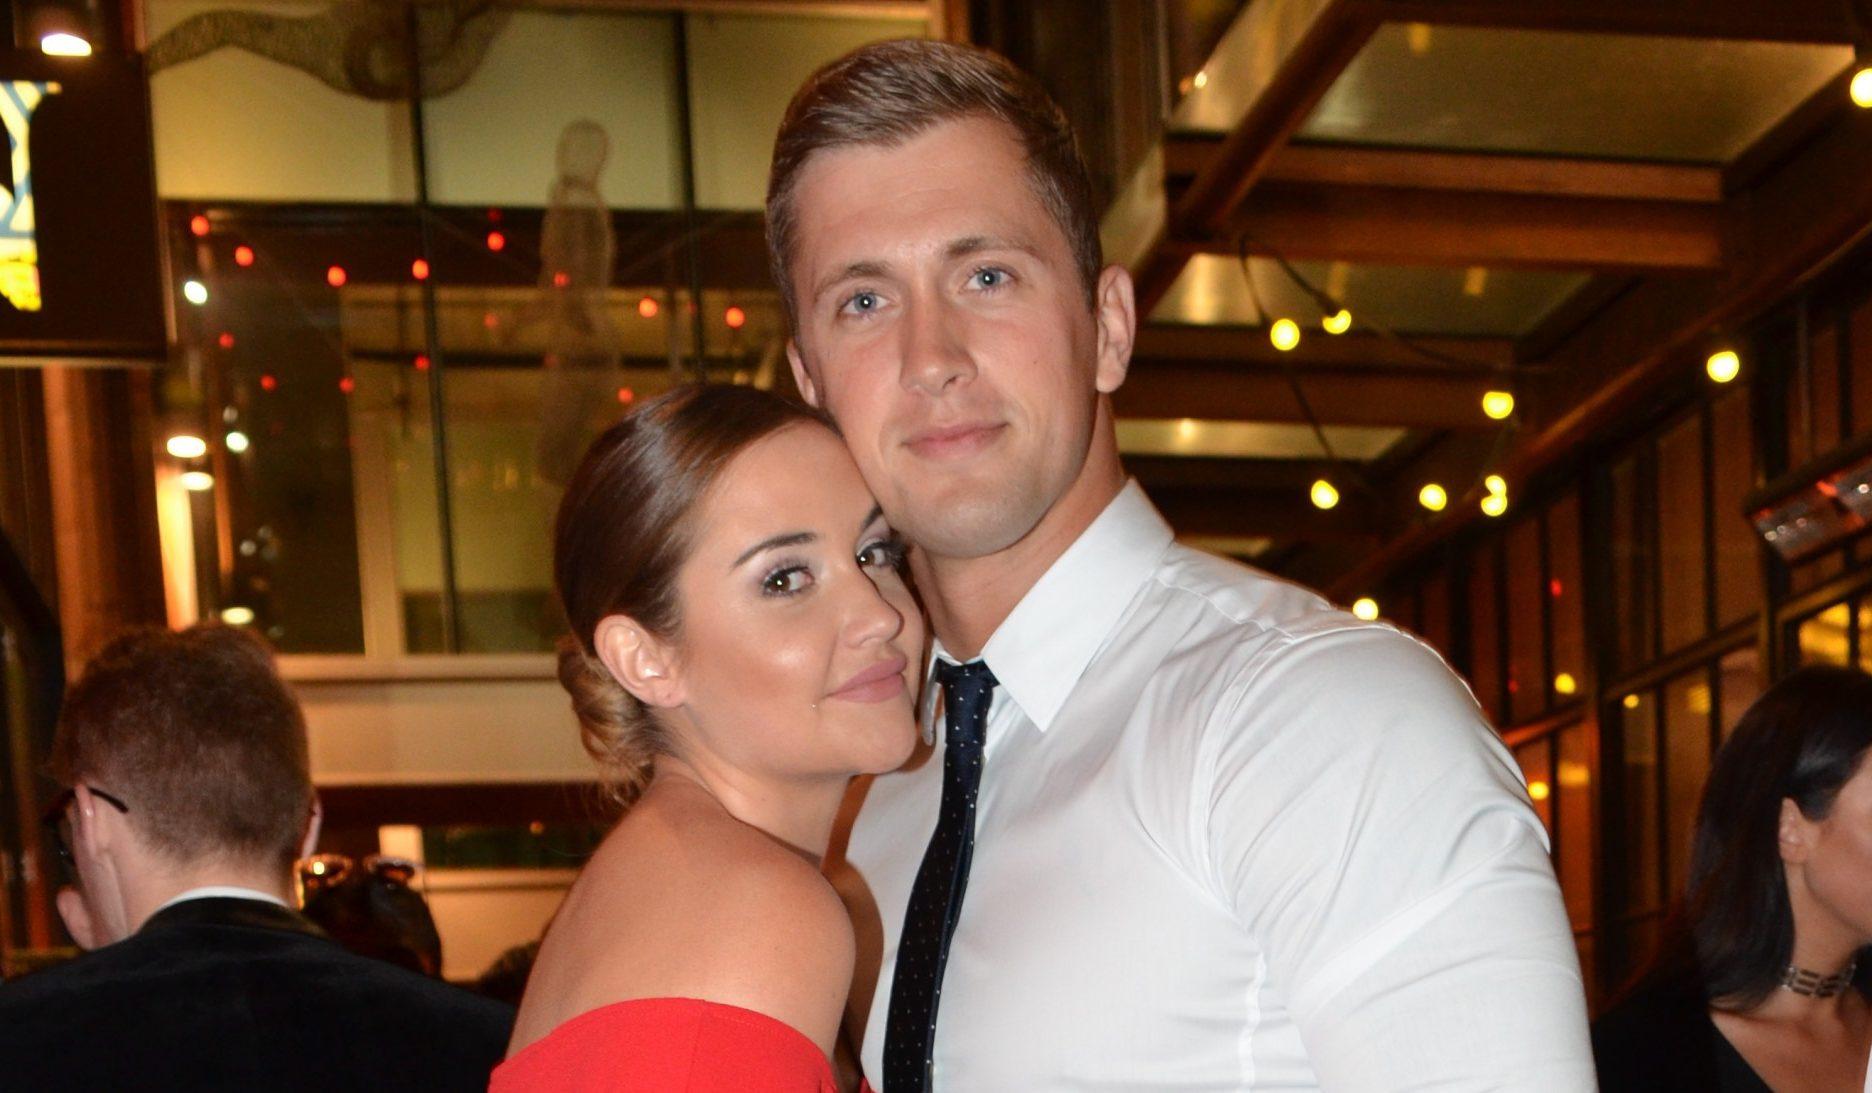 Have Dan Osborne and Jacqueline Jossa split?